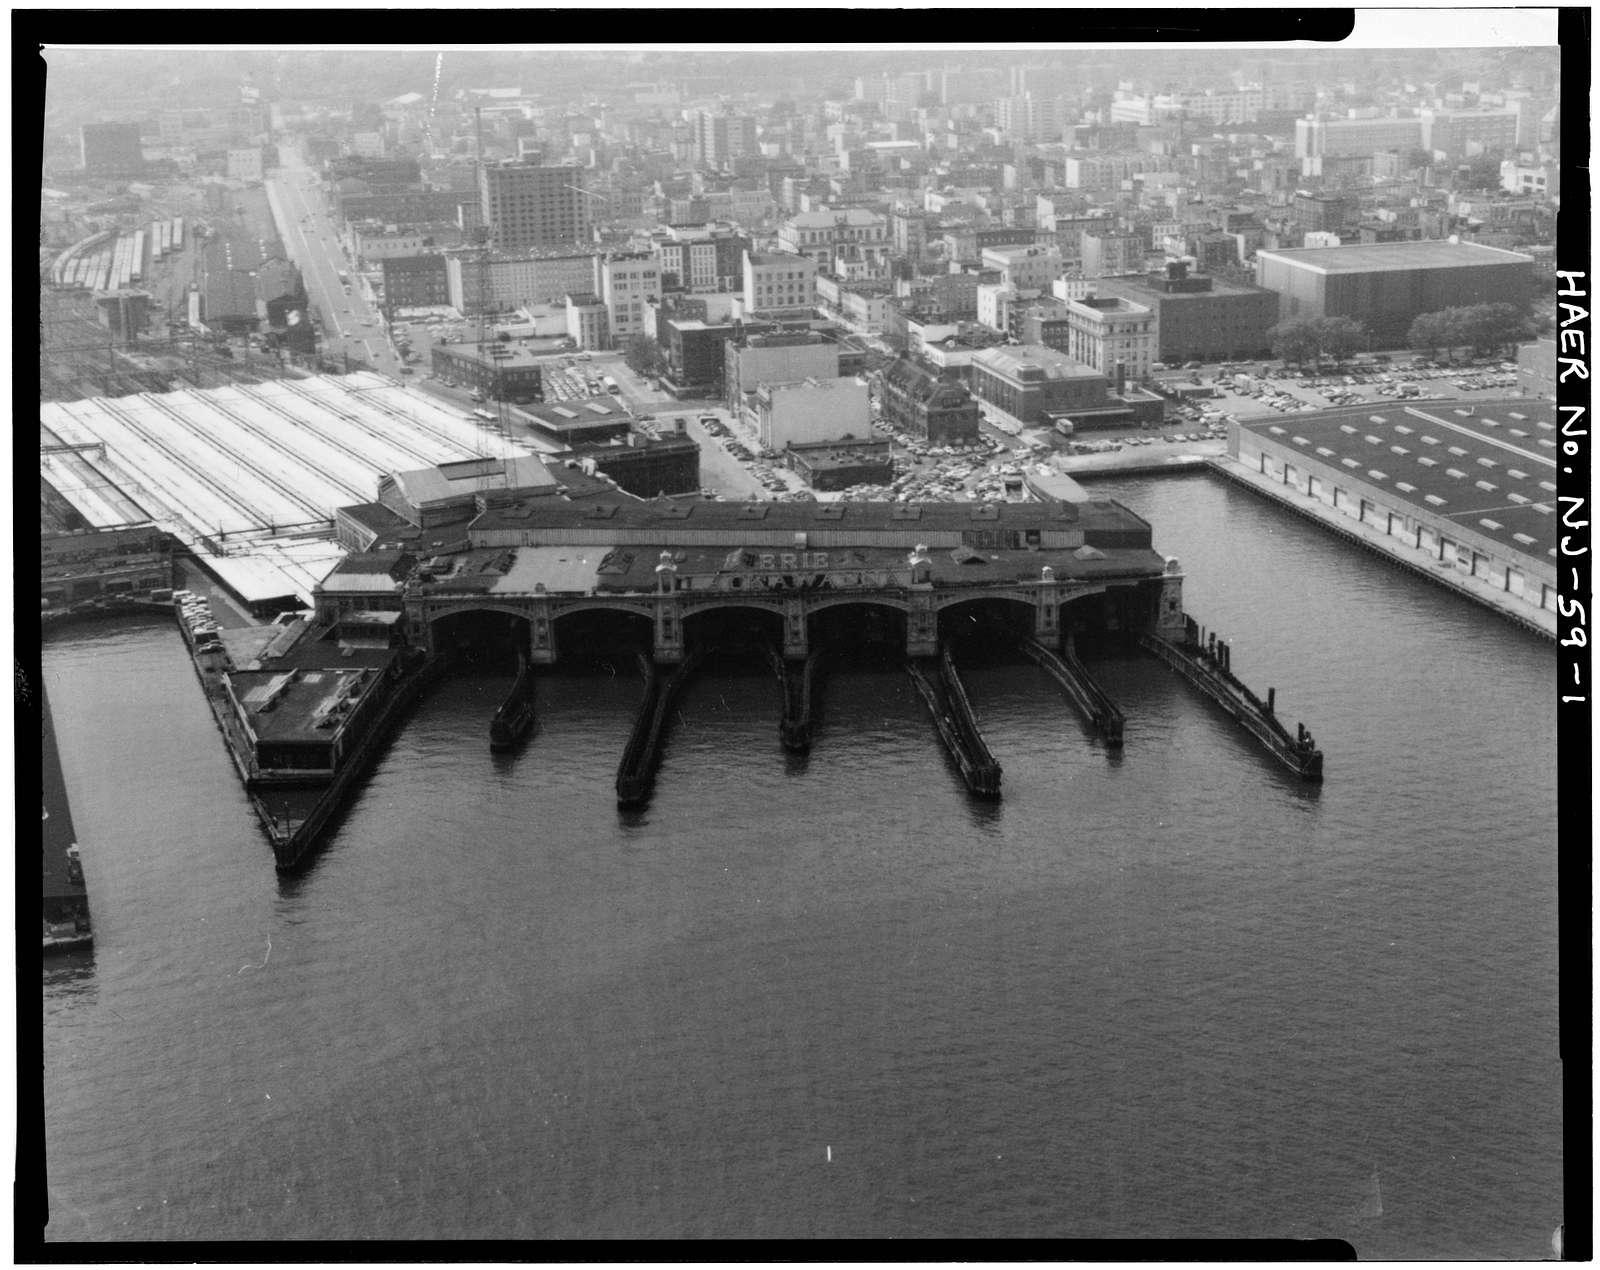 Delaware, Lackawanna & Western Railroad & Ferry Terminal, Ferry Slips & Bridges, Bounded by Observer, Newark & River Streets, Hudson River, Hoboken, Hudson County, NJ